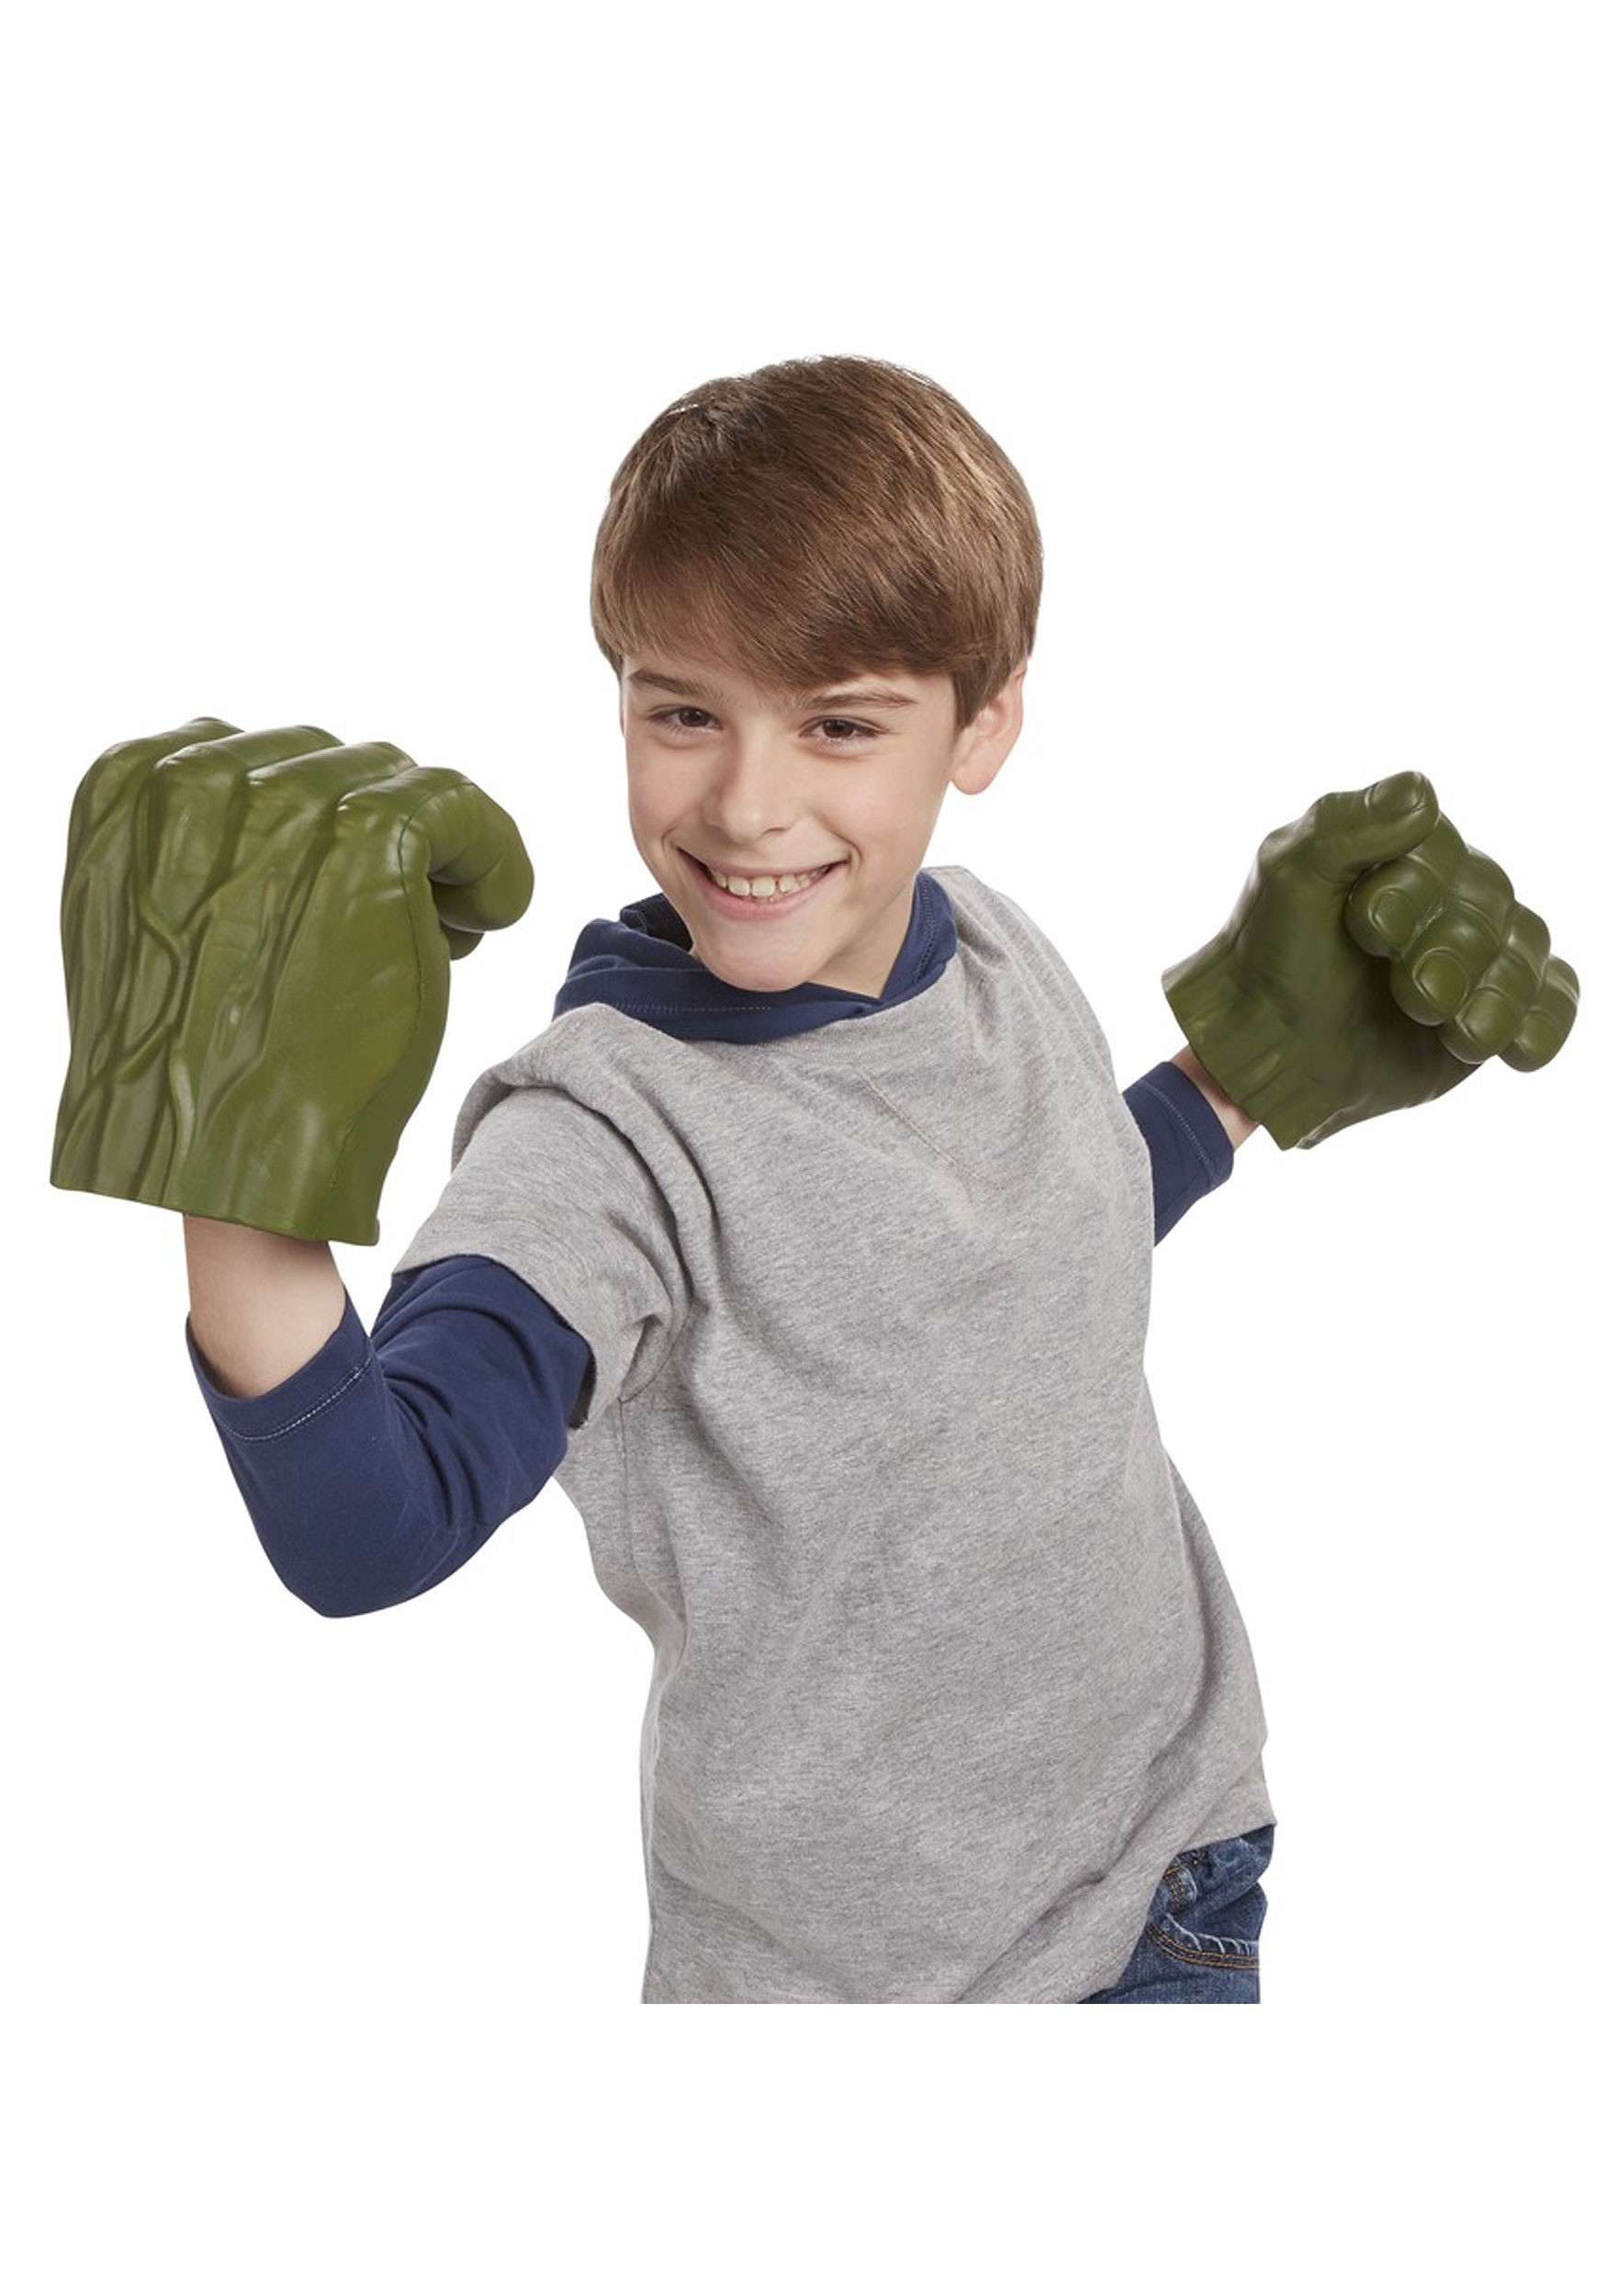 Avengers Kids' Hulk Gamma Fists